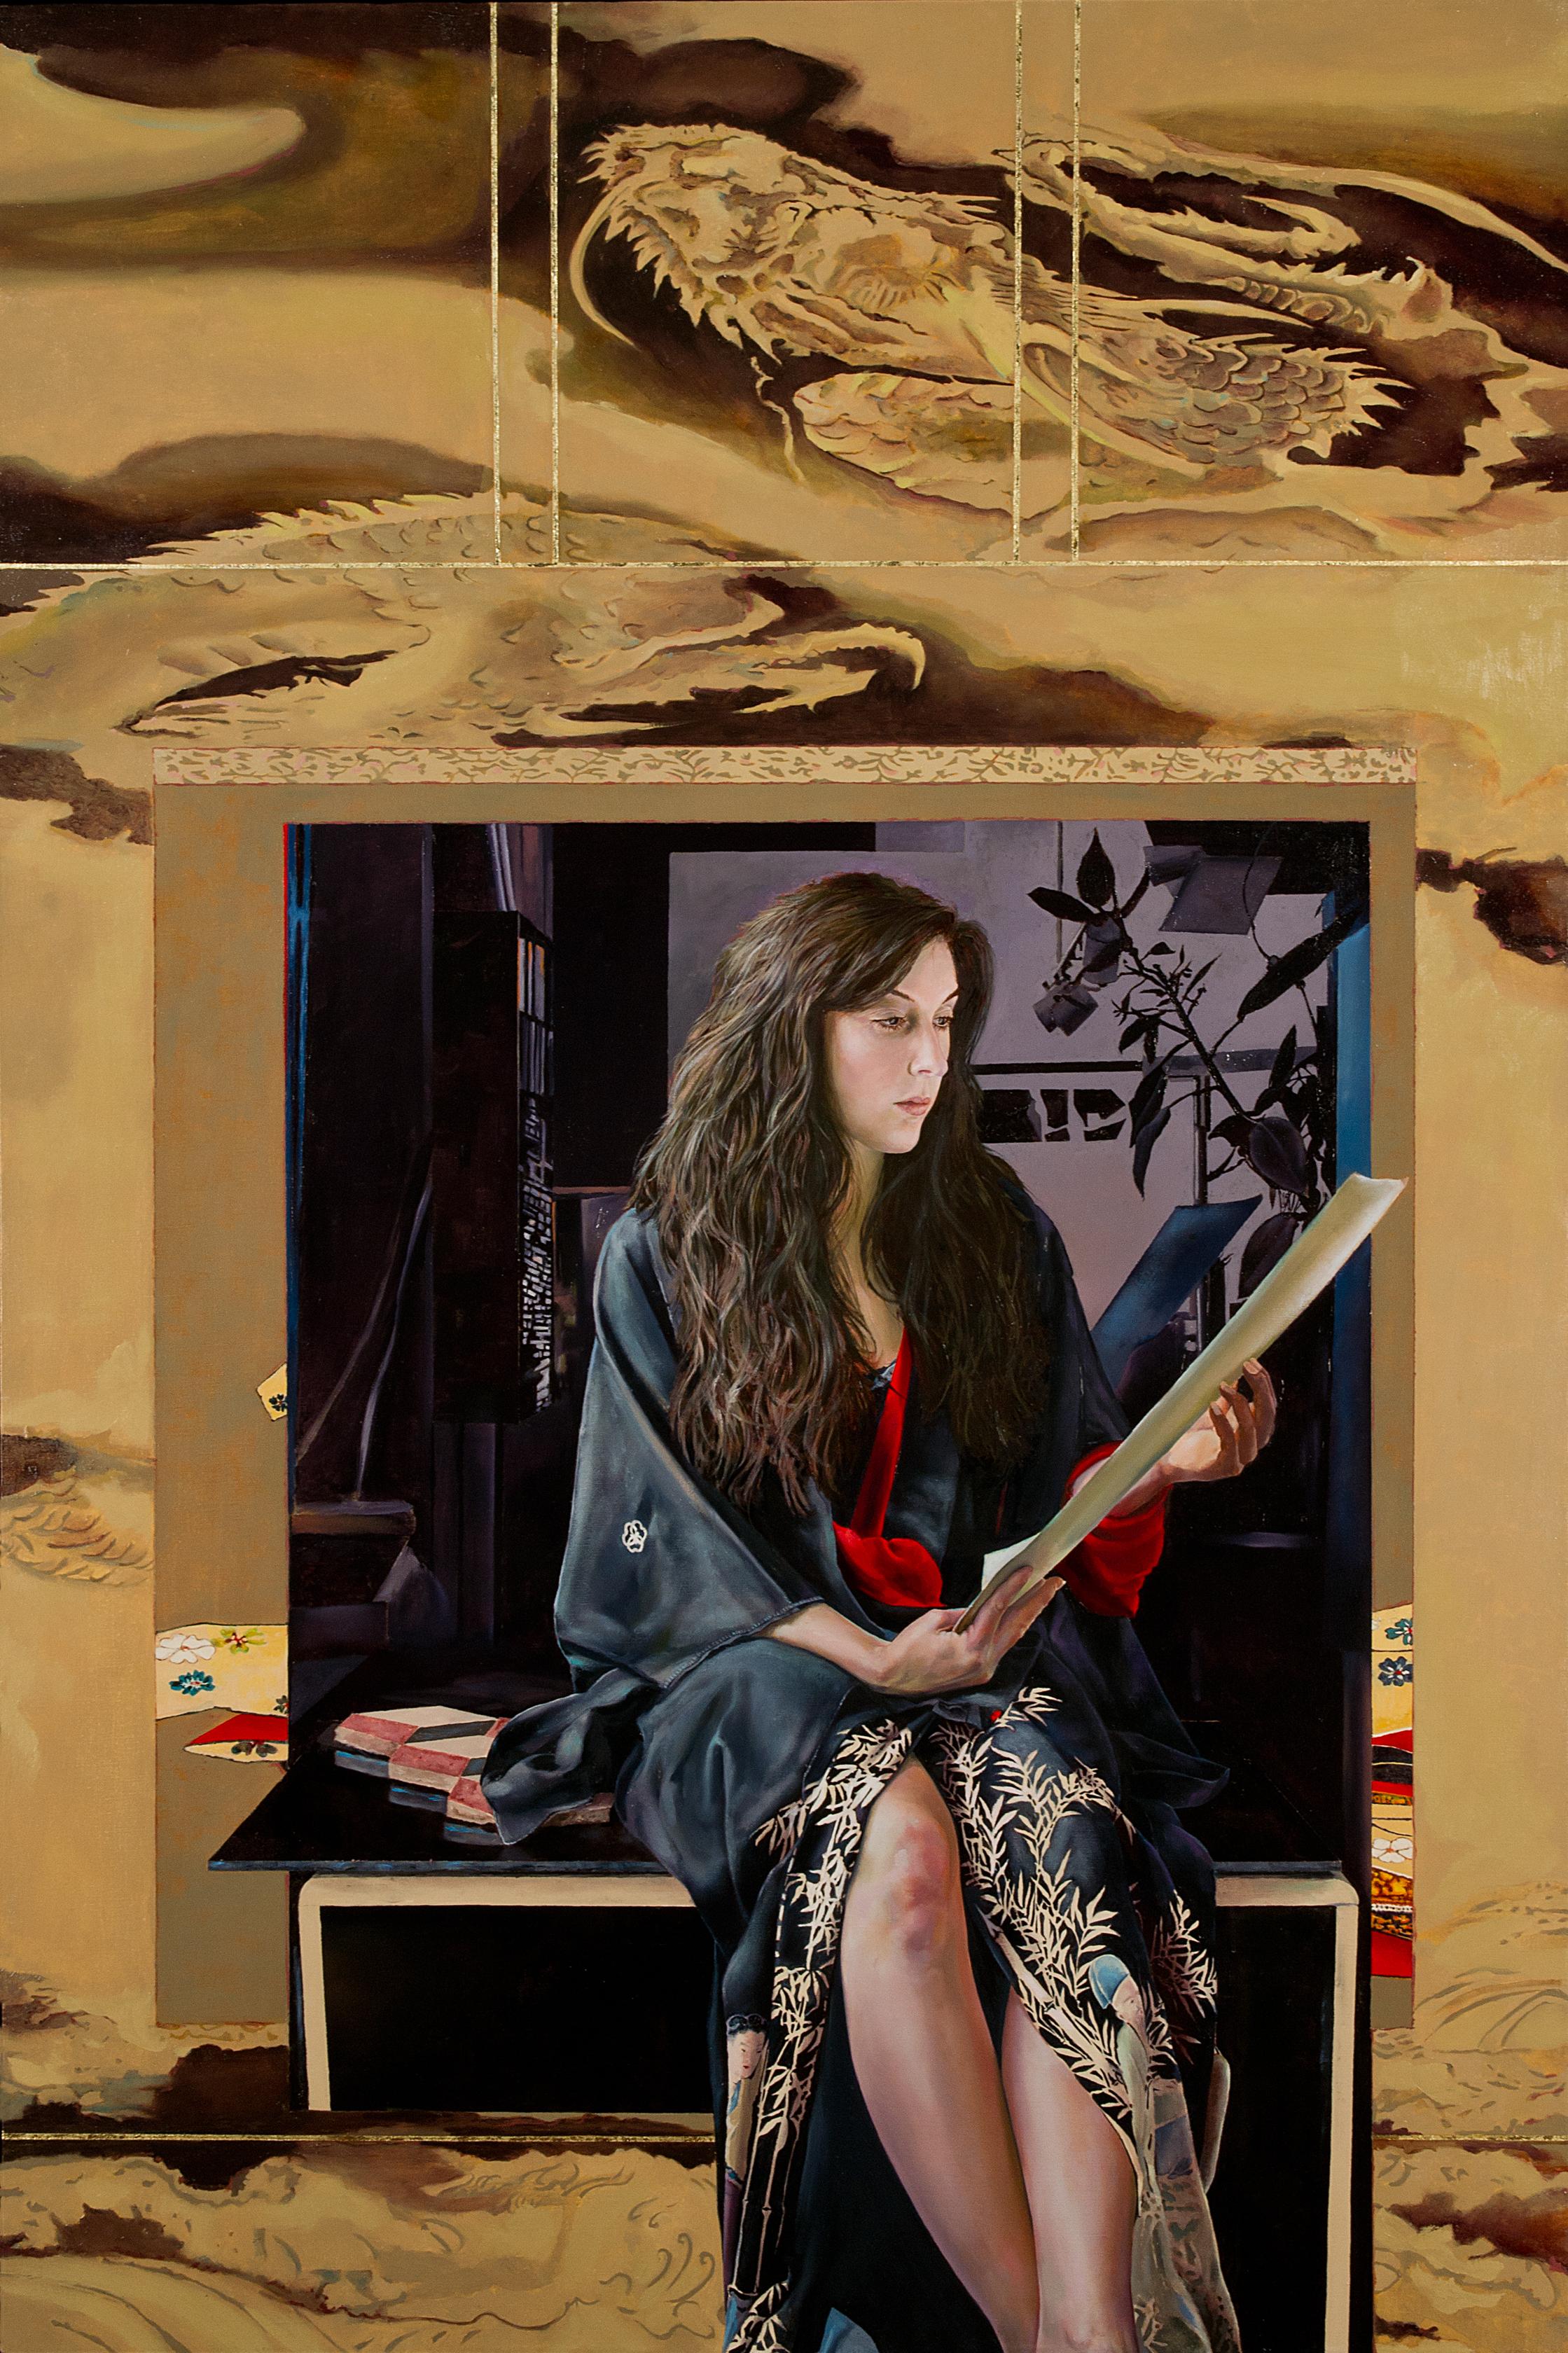 The Poet: Amagoi Komachi (Rain – asking Komachi)